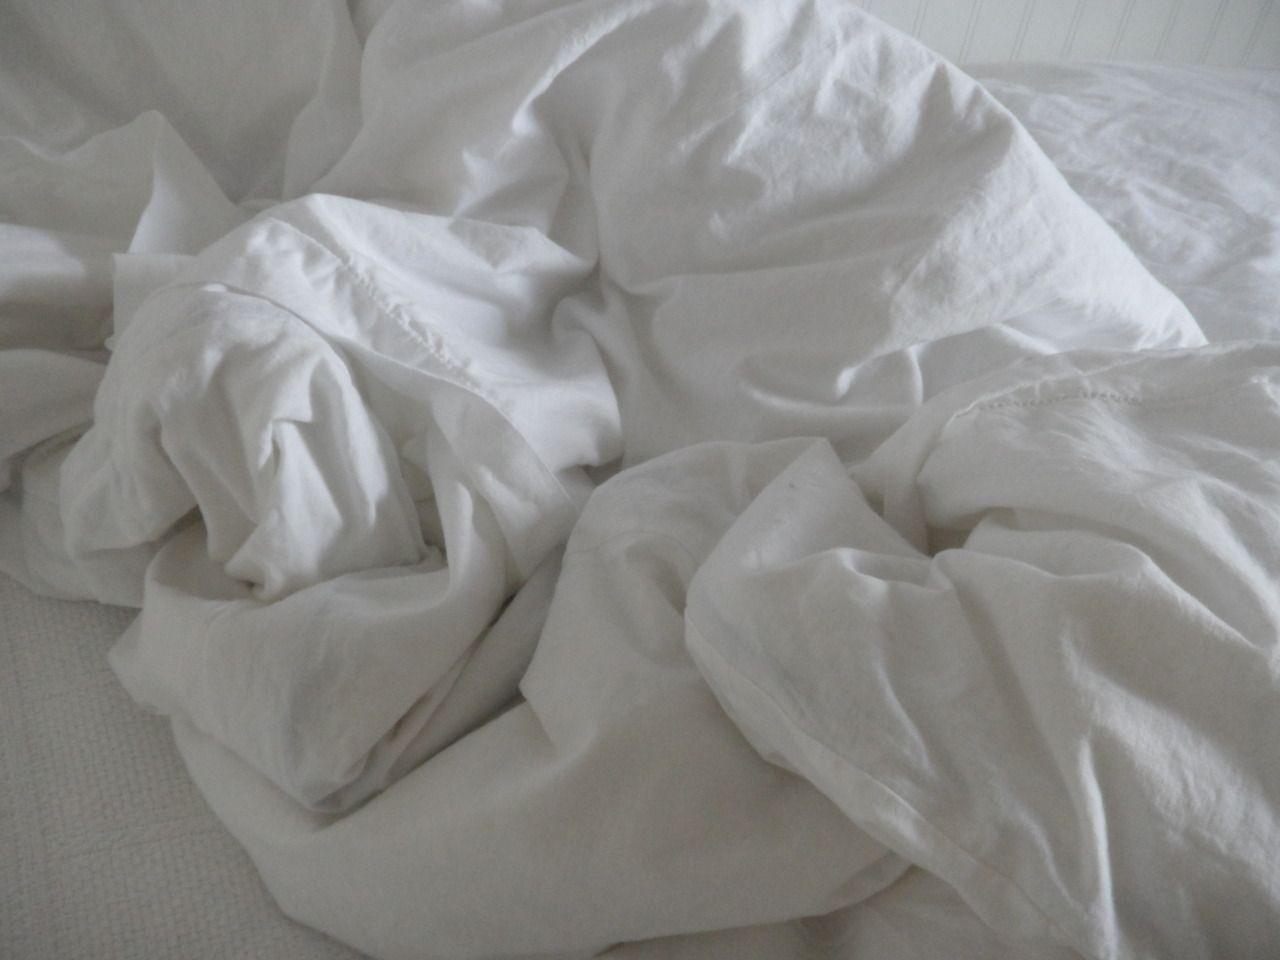 White bed sheets tumblr - White Bed Sheets Tumblr 16